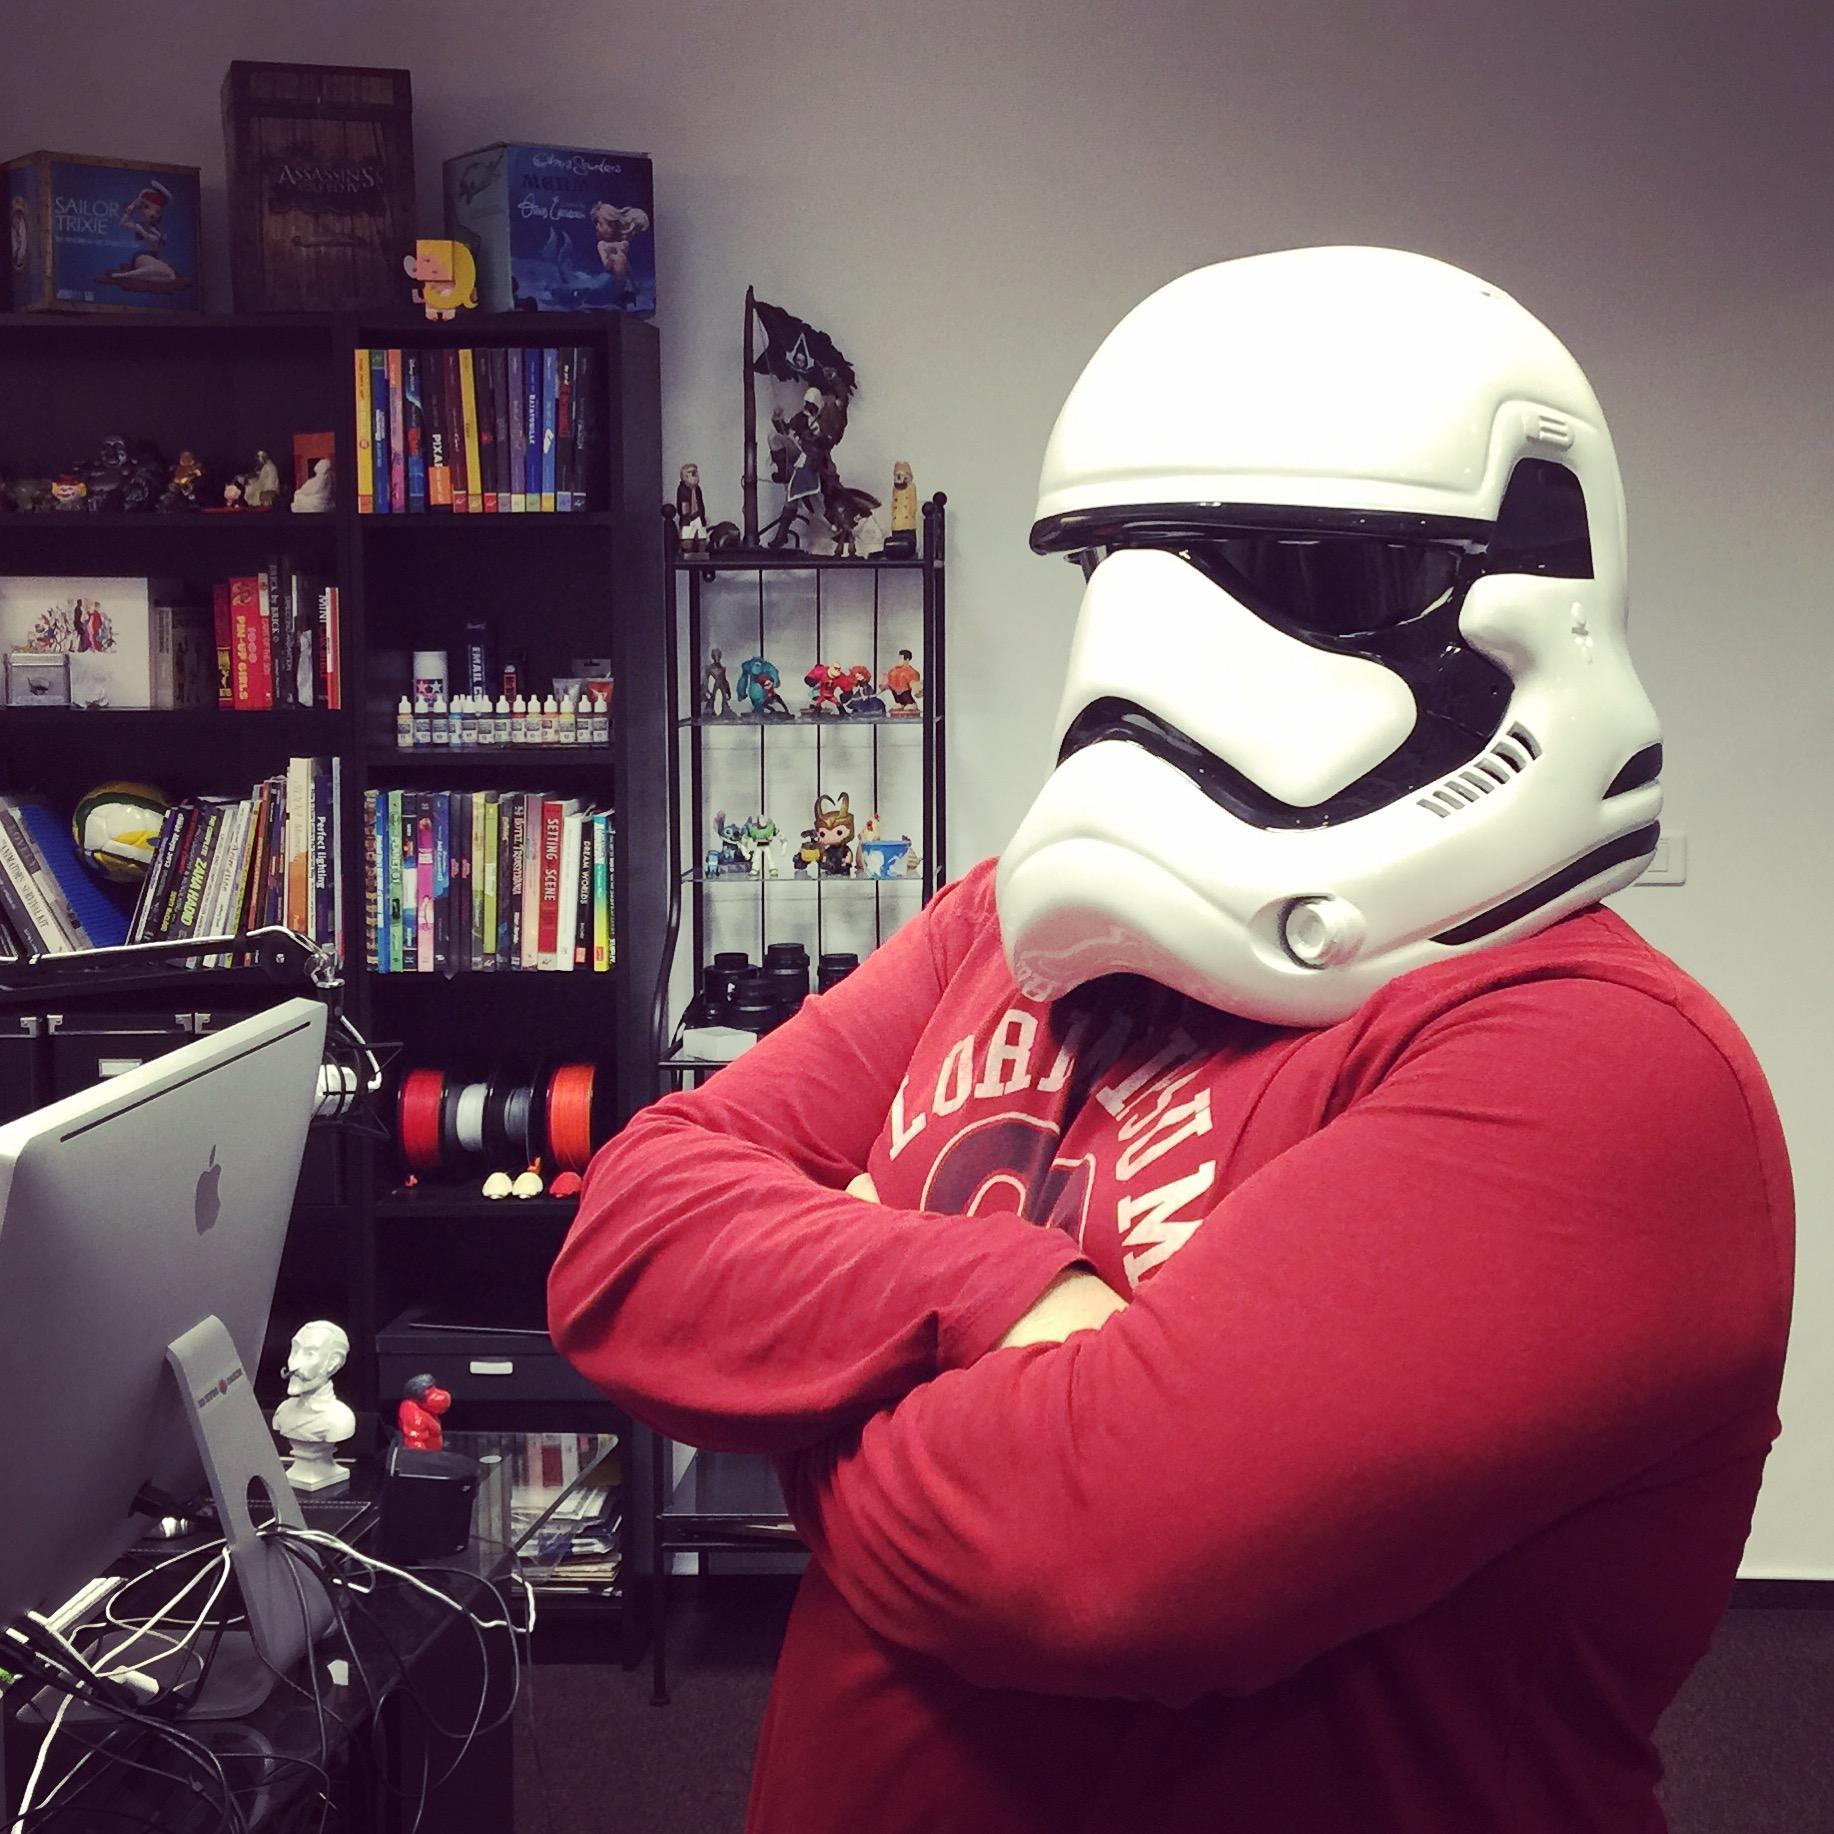 3D Printable Fully Wearable Star Wars VII Storm Trooper